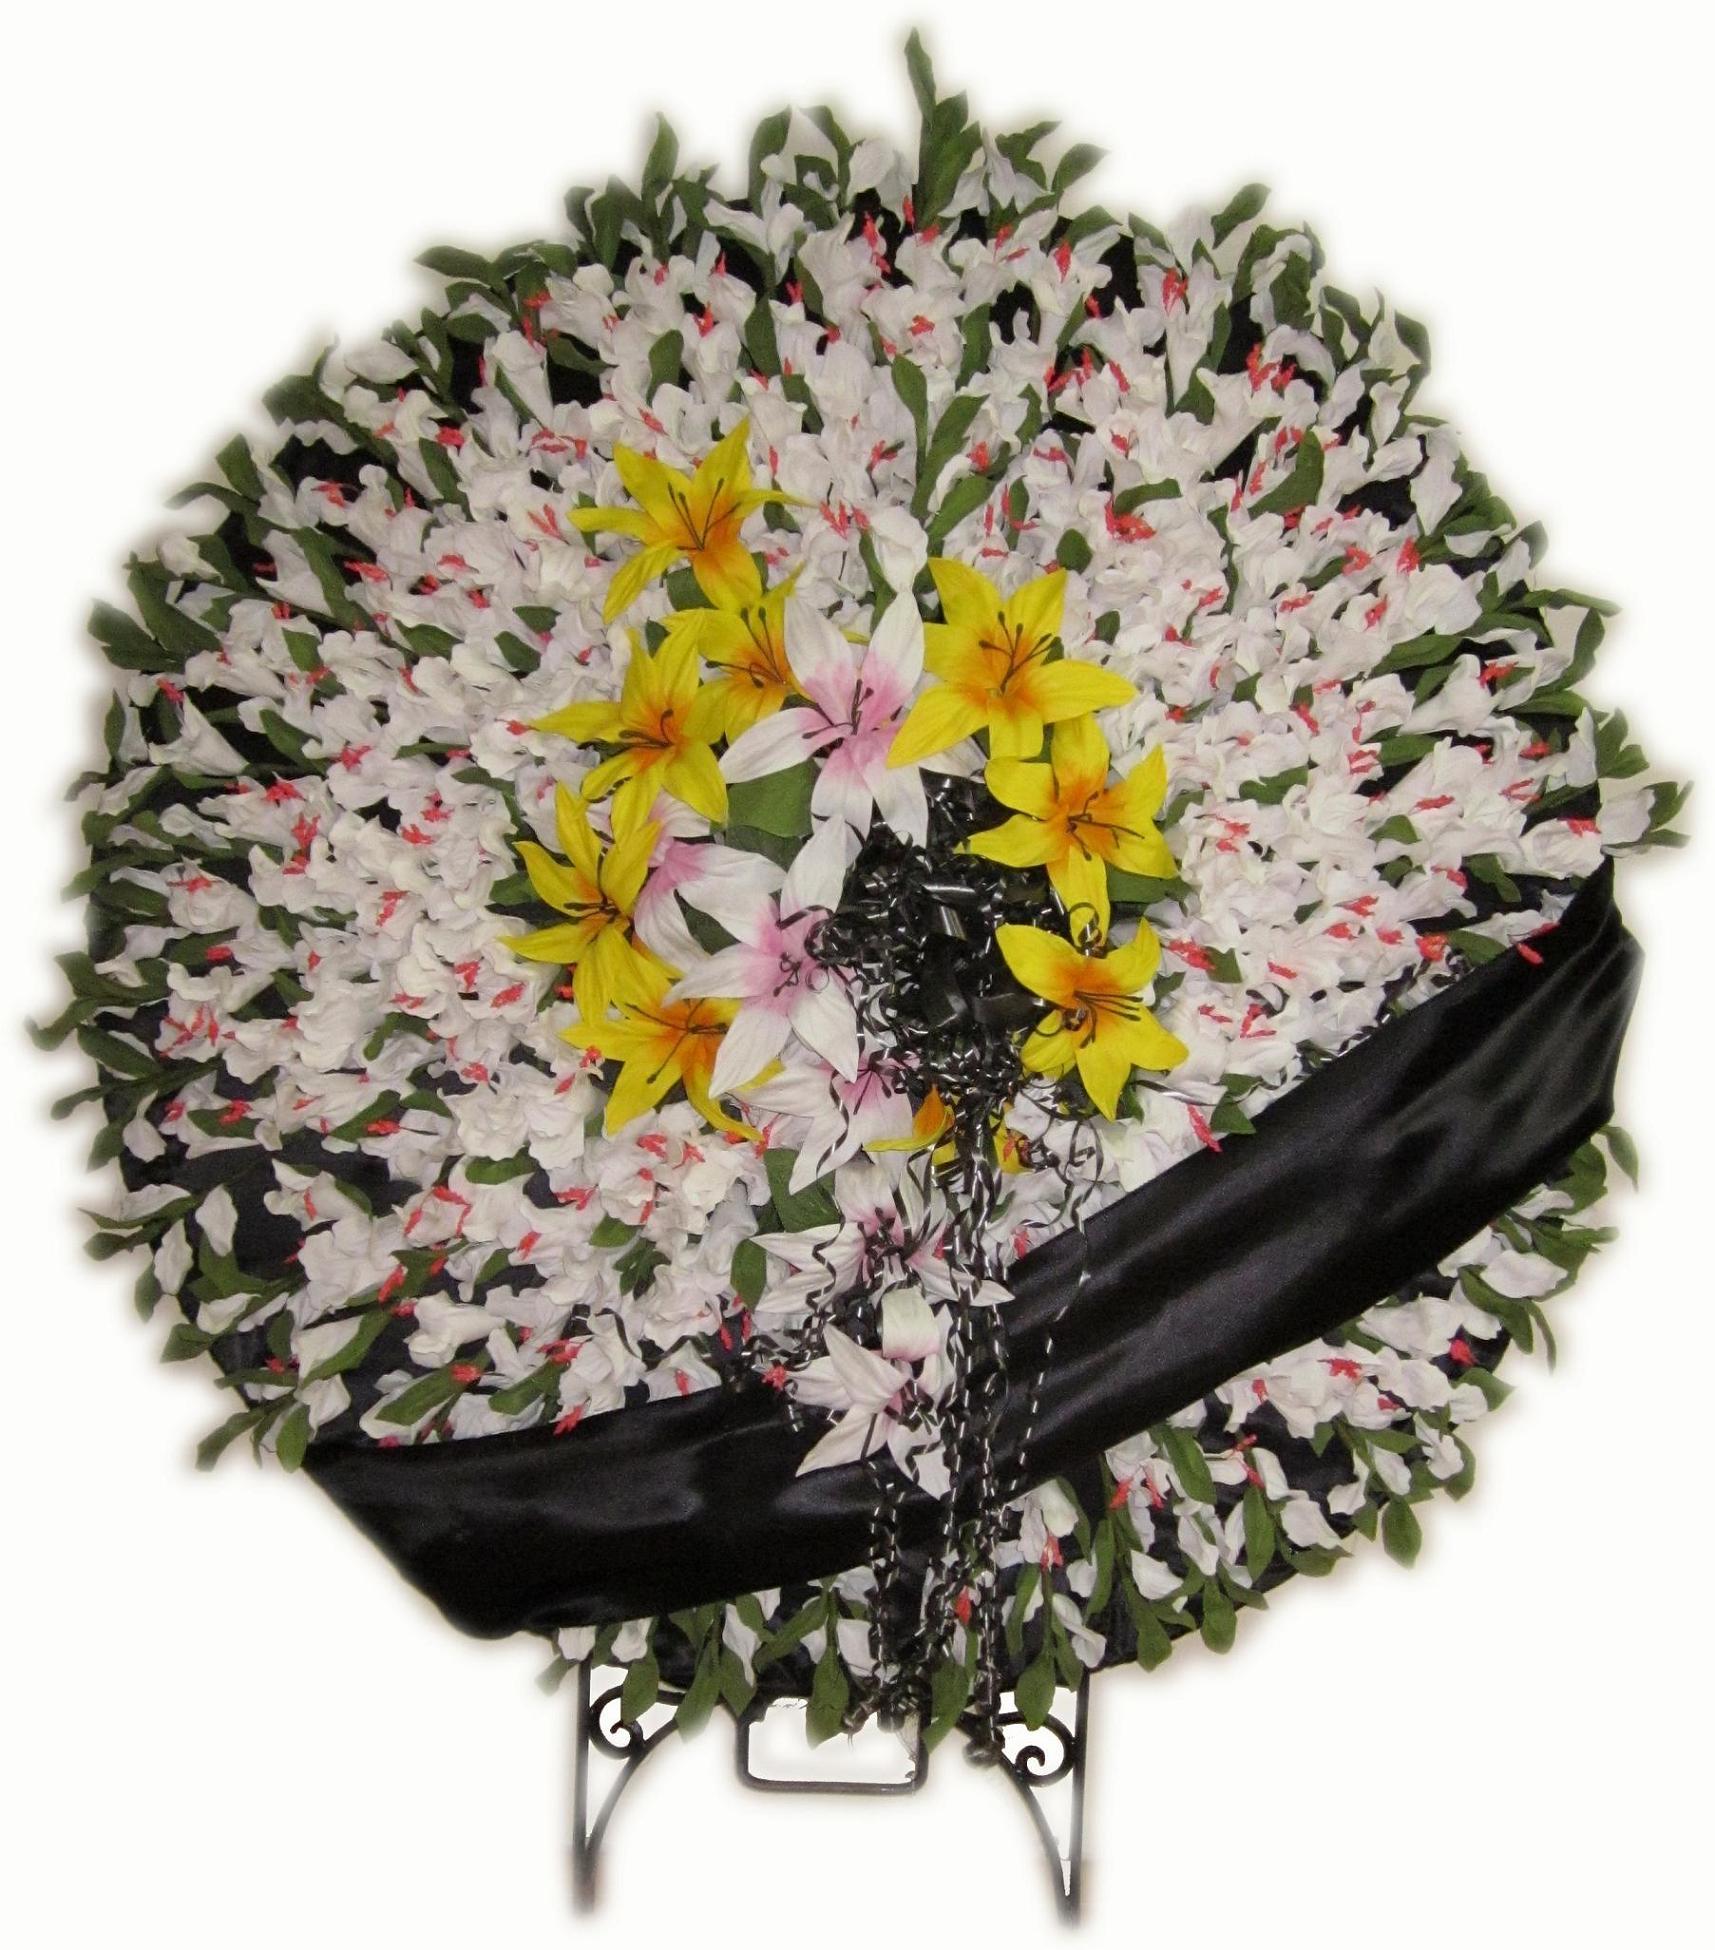 Image result for گل برای عزا